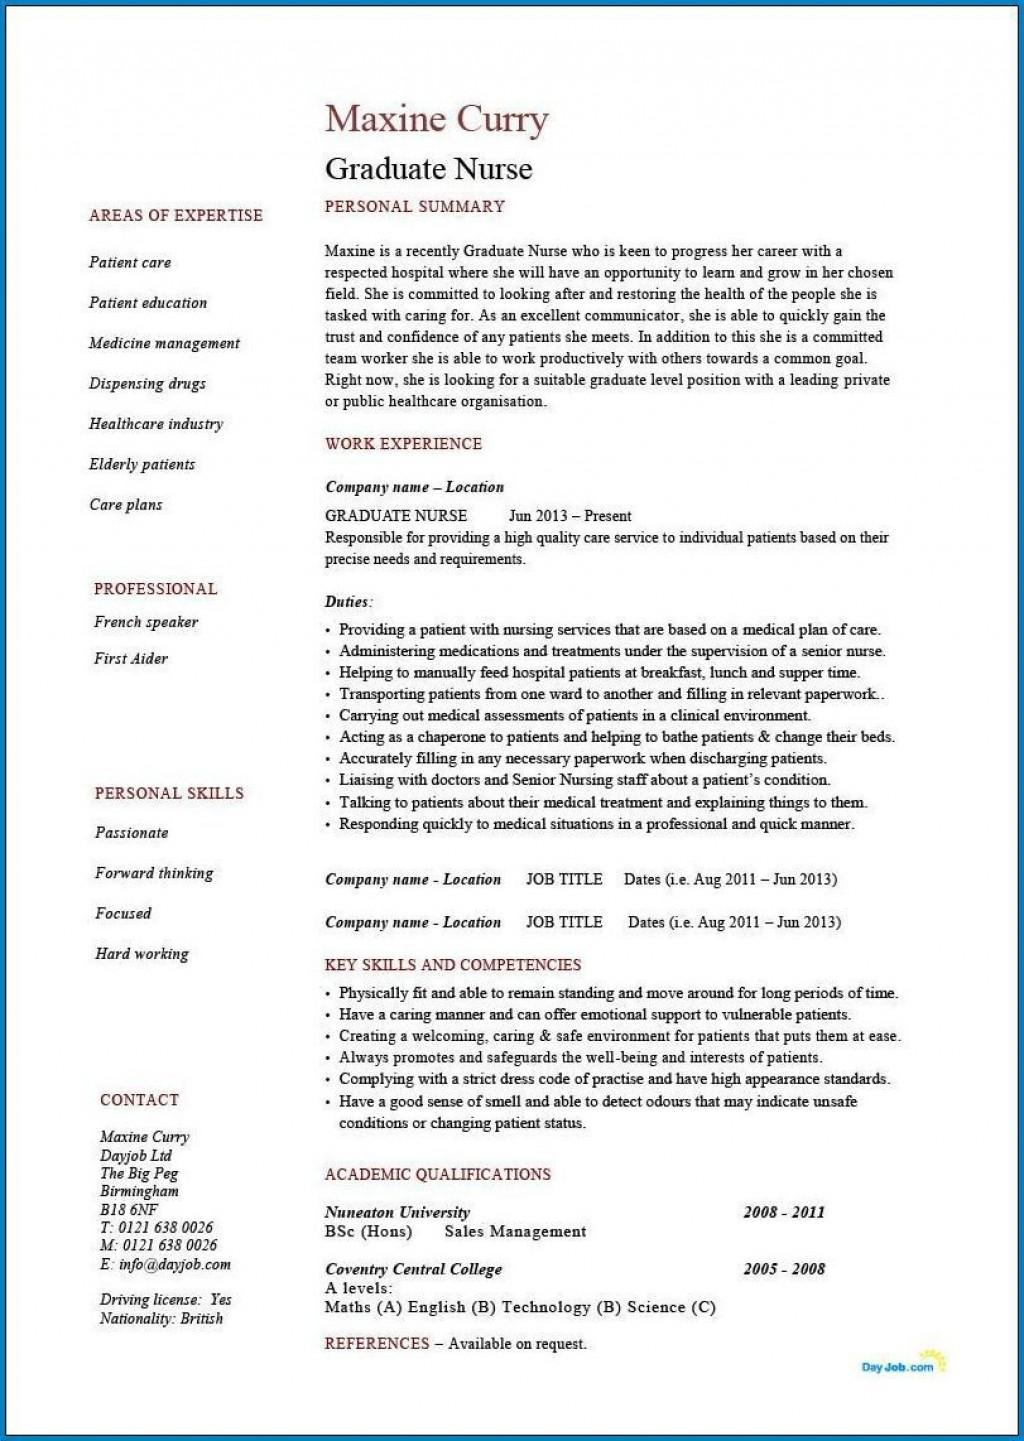 004 Phenomenal Rn Graduate Resume Template Inspiration  New Grad NurseLarge